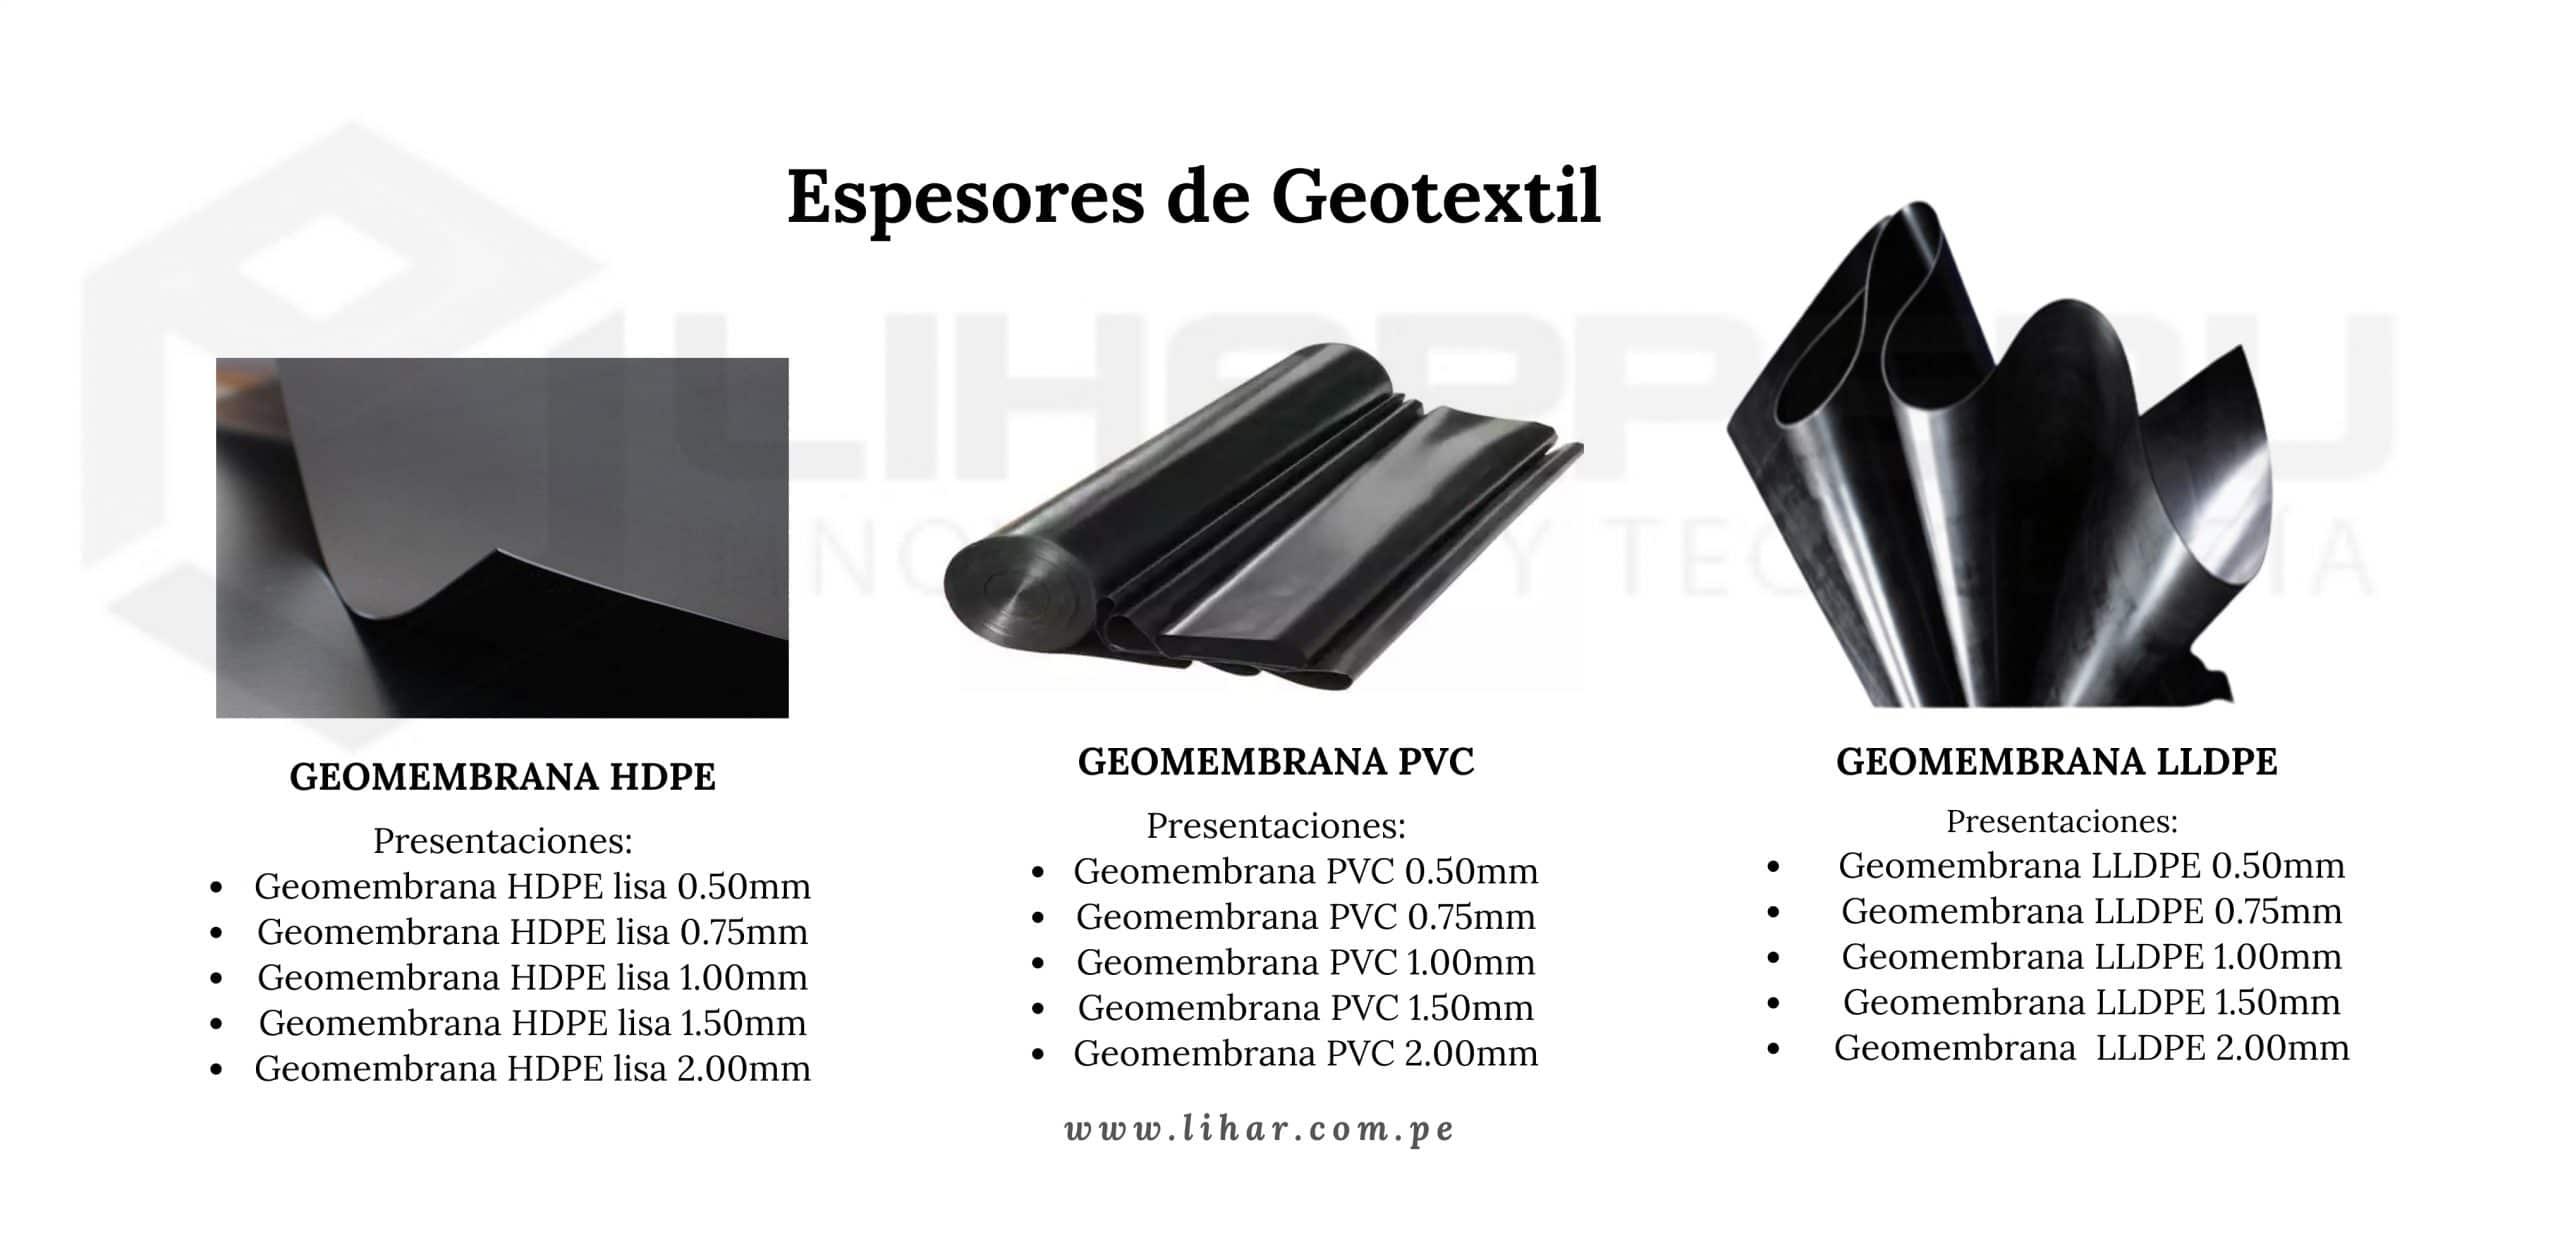 geomembrana costo m2 en perú